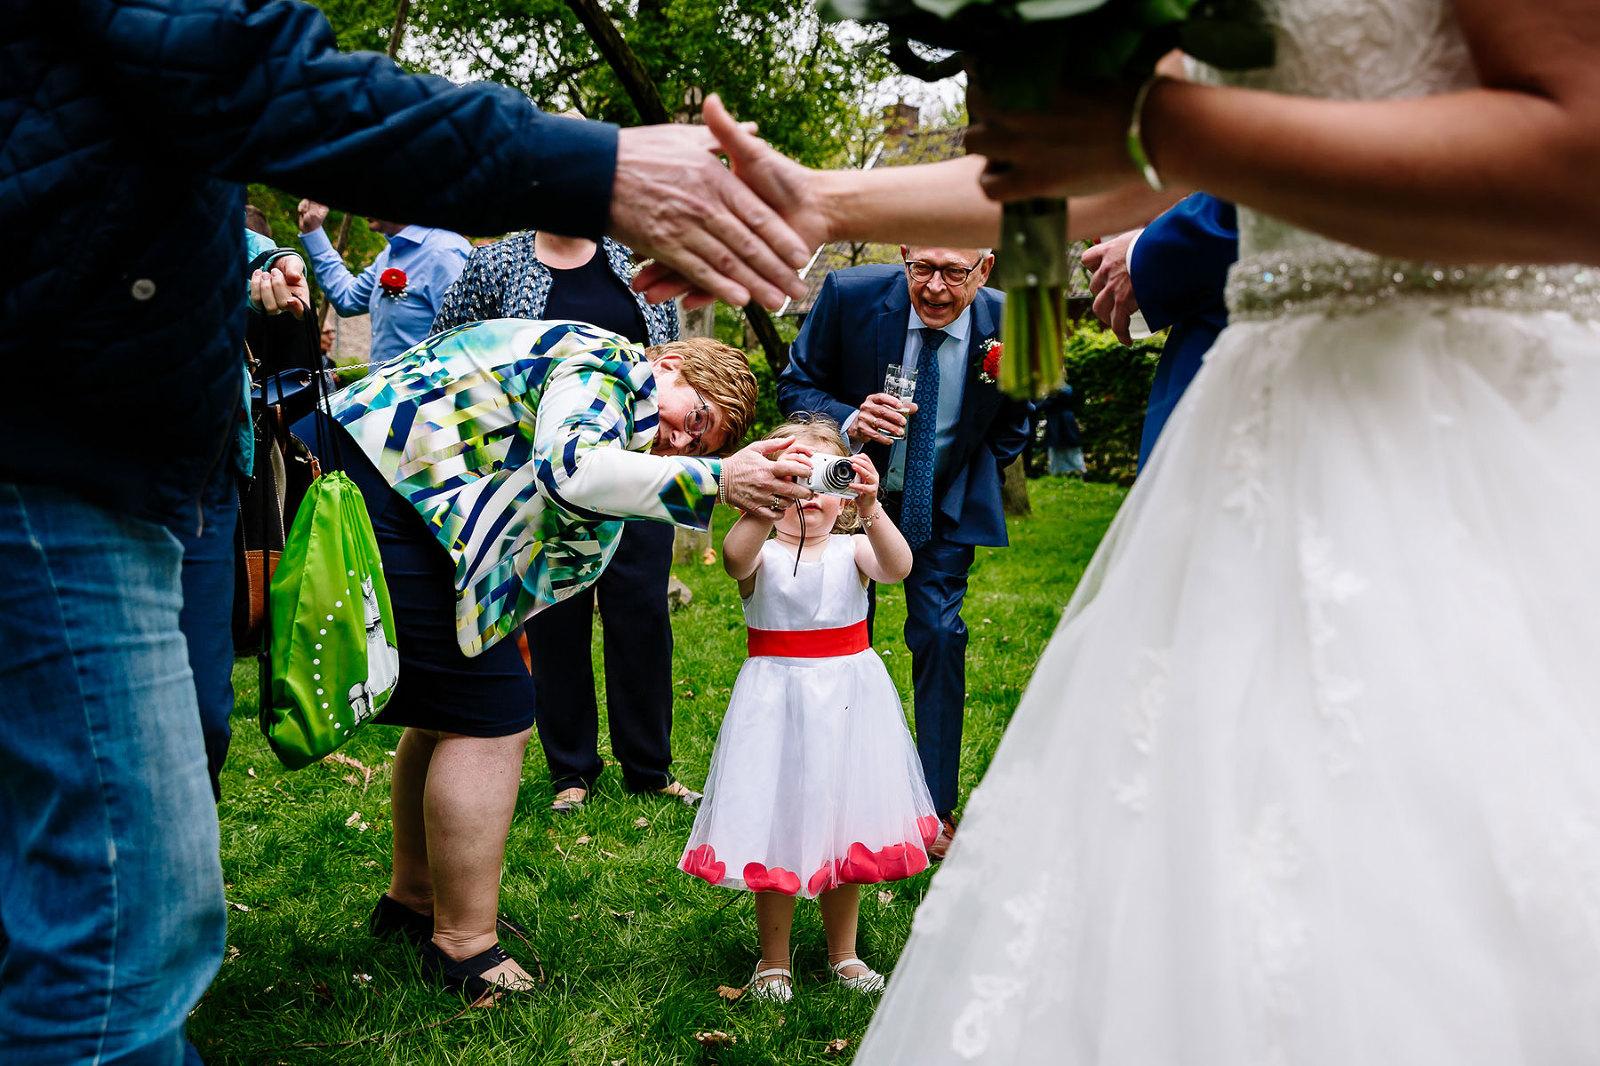 Werkwijze bruidsfotograaf, werkwijze bruidsfotografie, werkwijze, bruidsfotografie, bruidsfotograaf